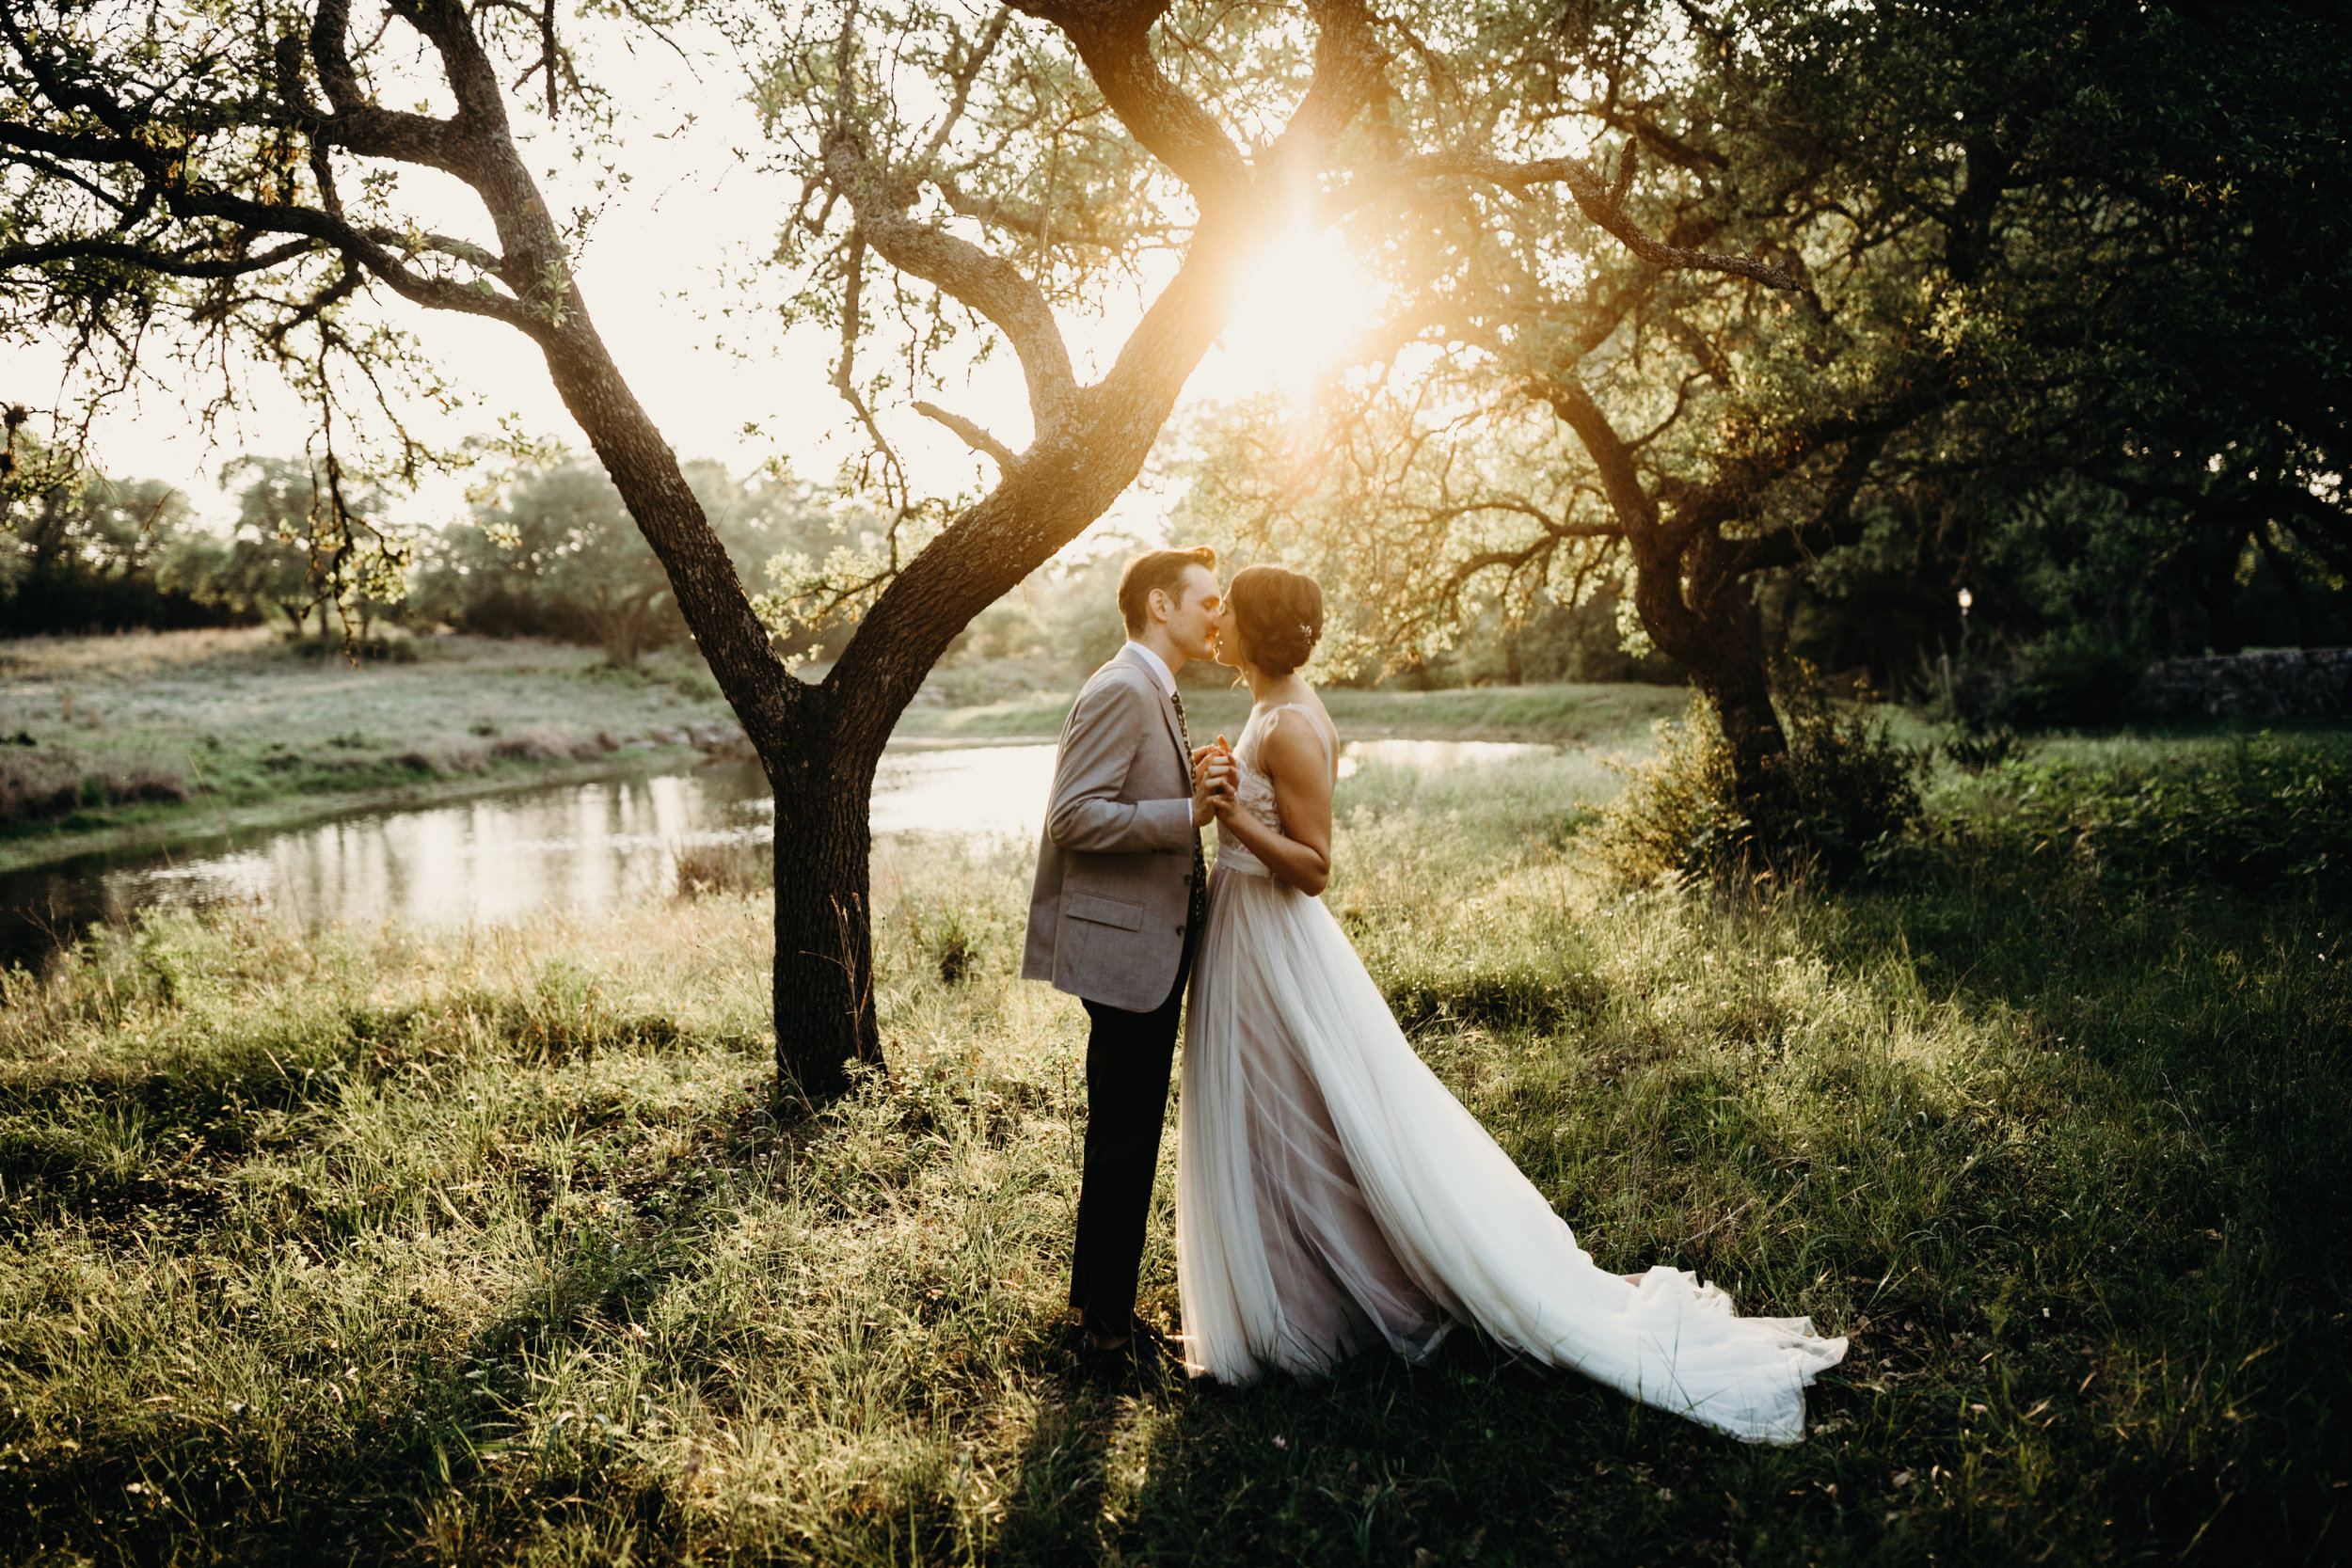 austin-wedding-lindsey-bryce-516.jpg